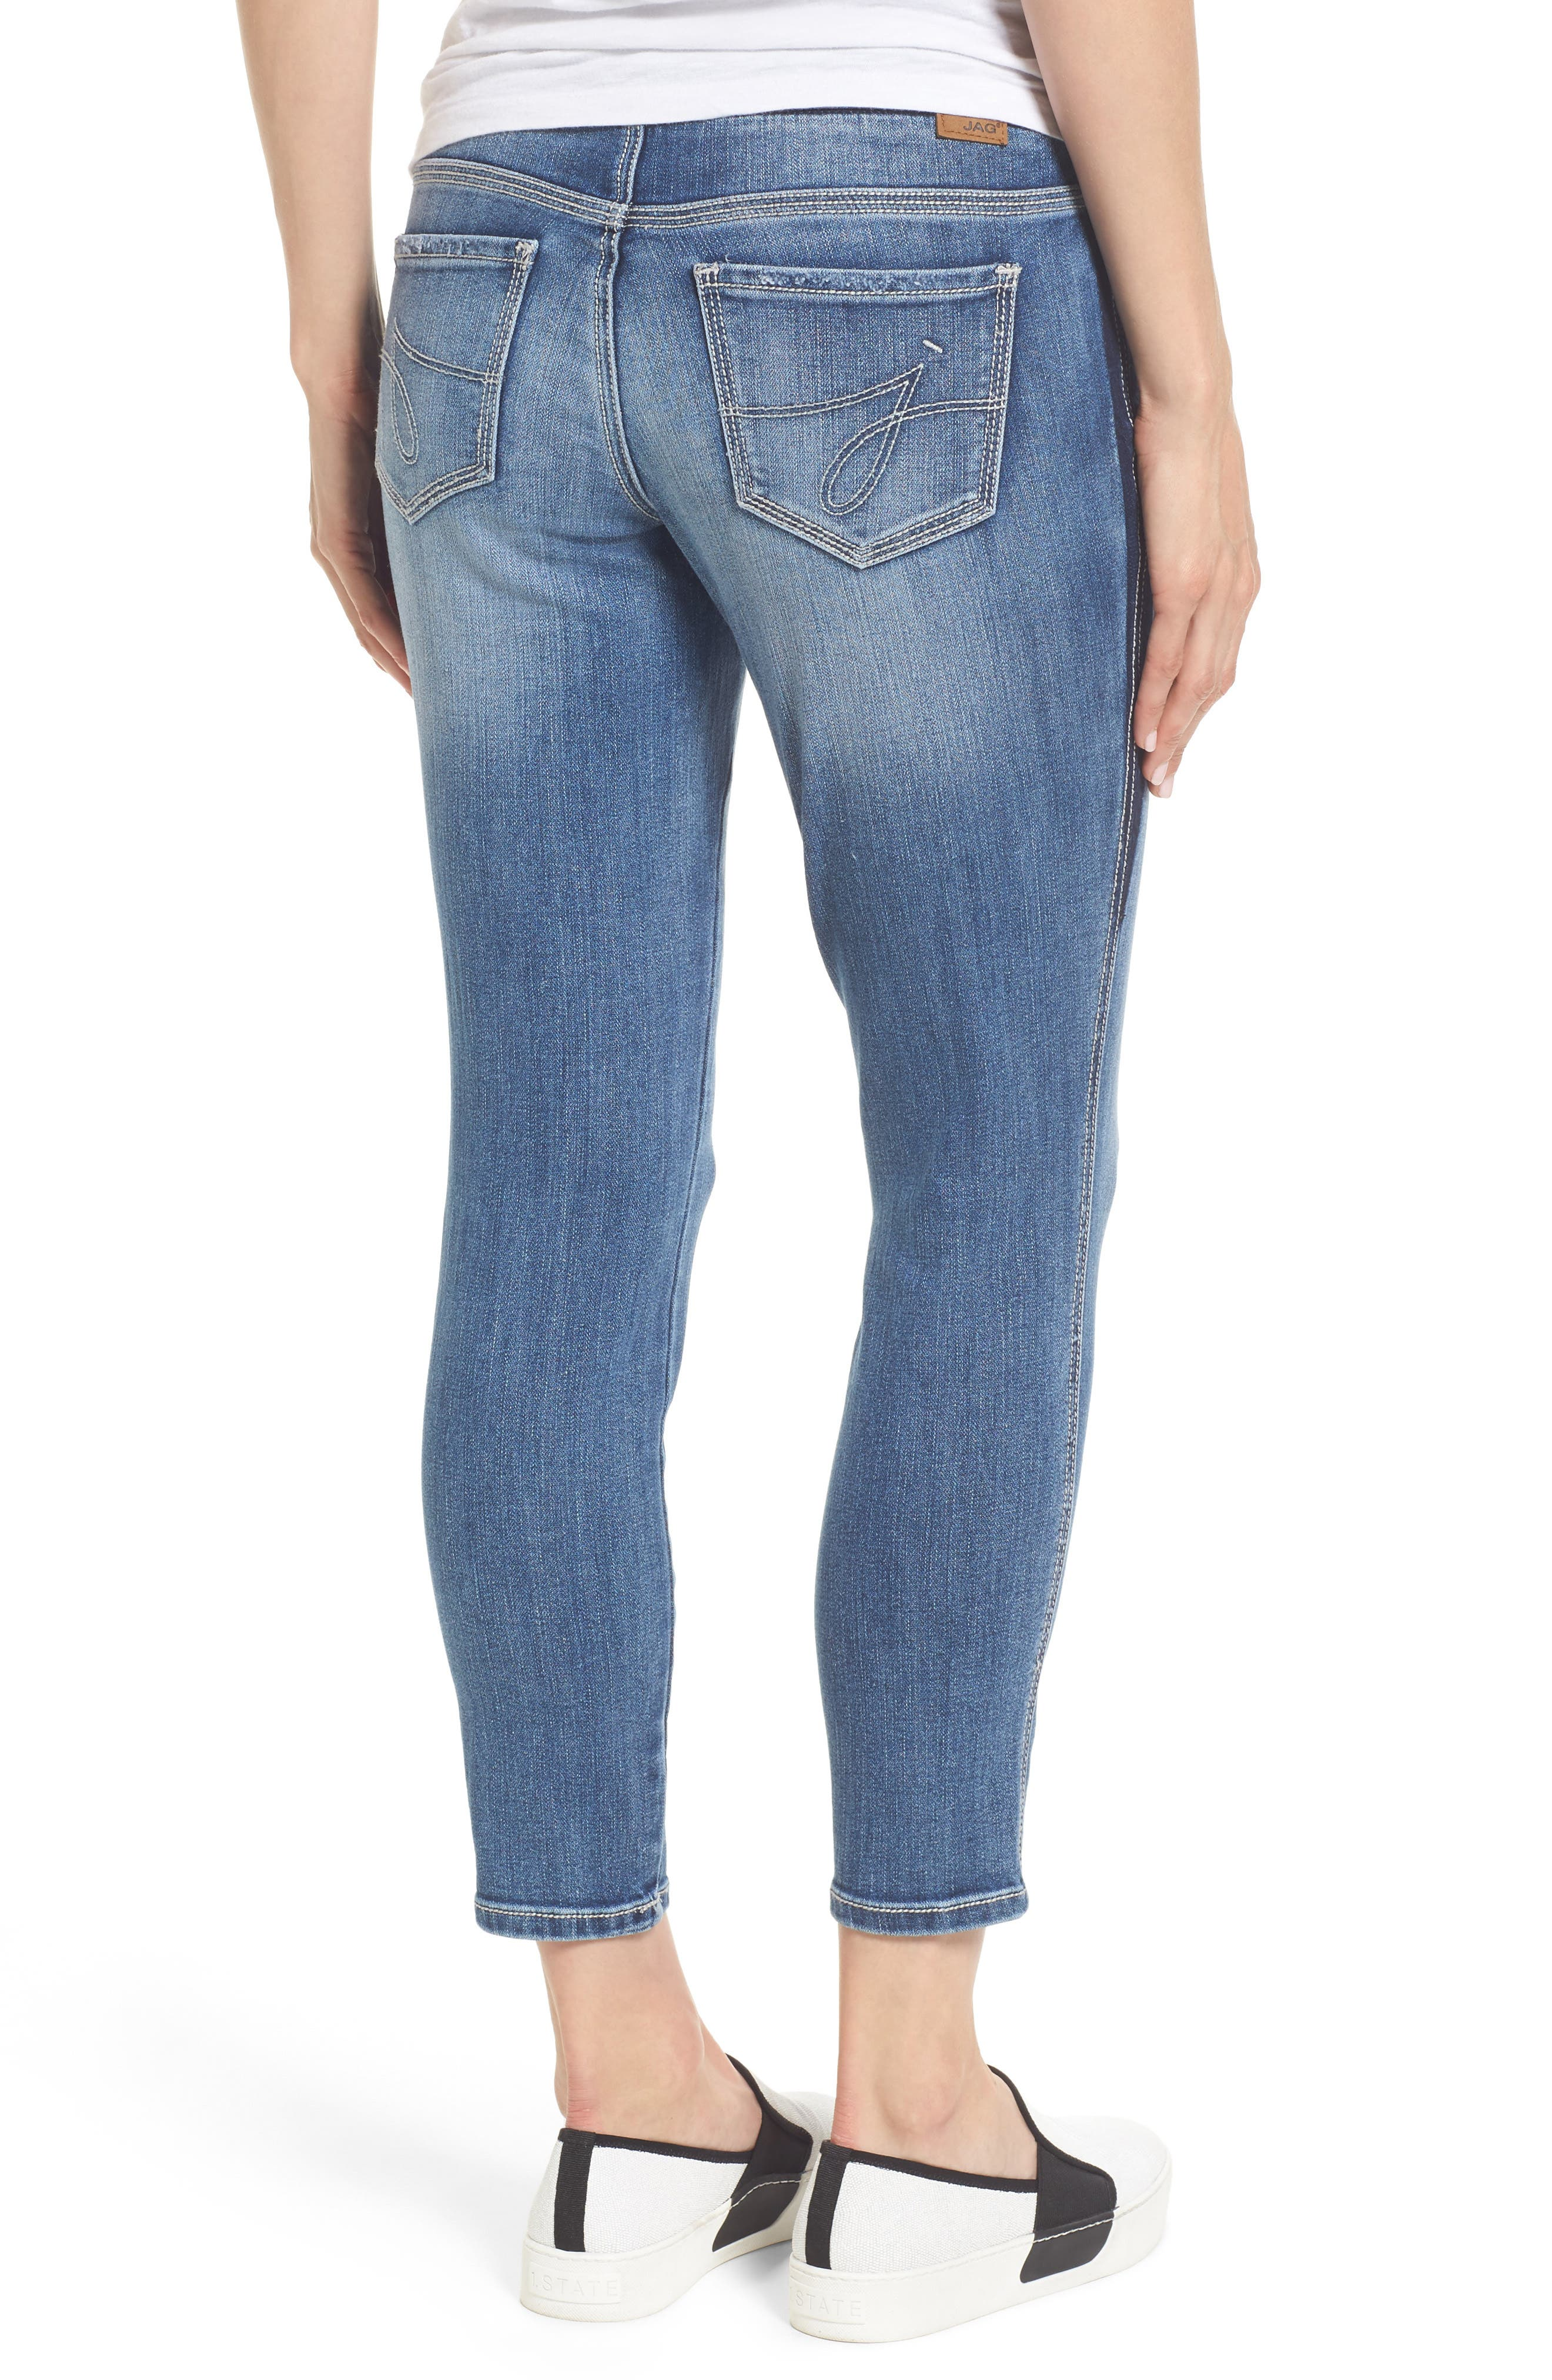 Nora Marta Stretch Skinny Jeans,                             Alternate thumbnail 2, color,                             420